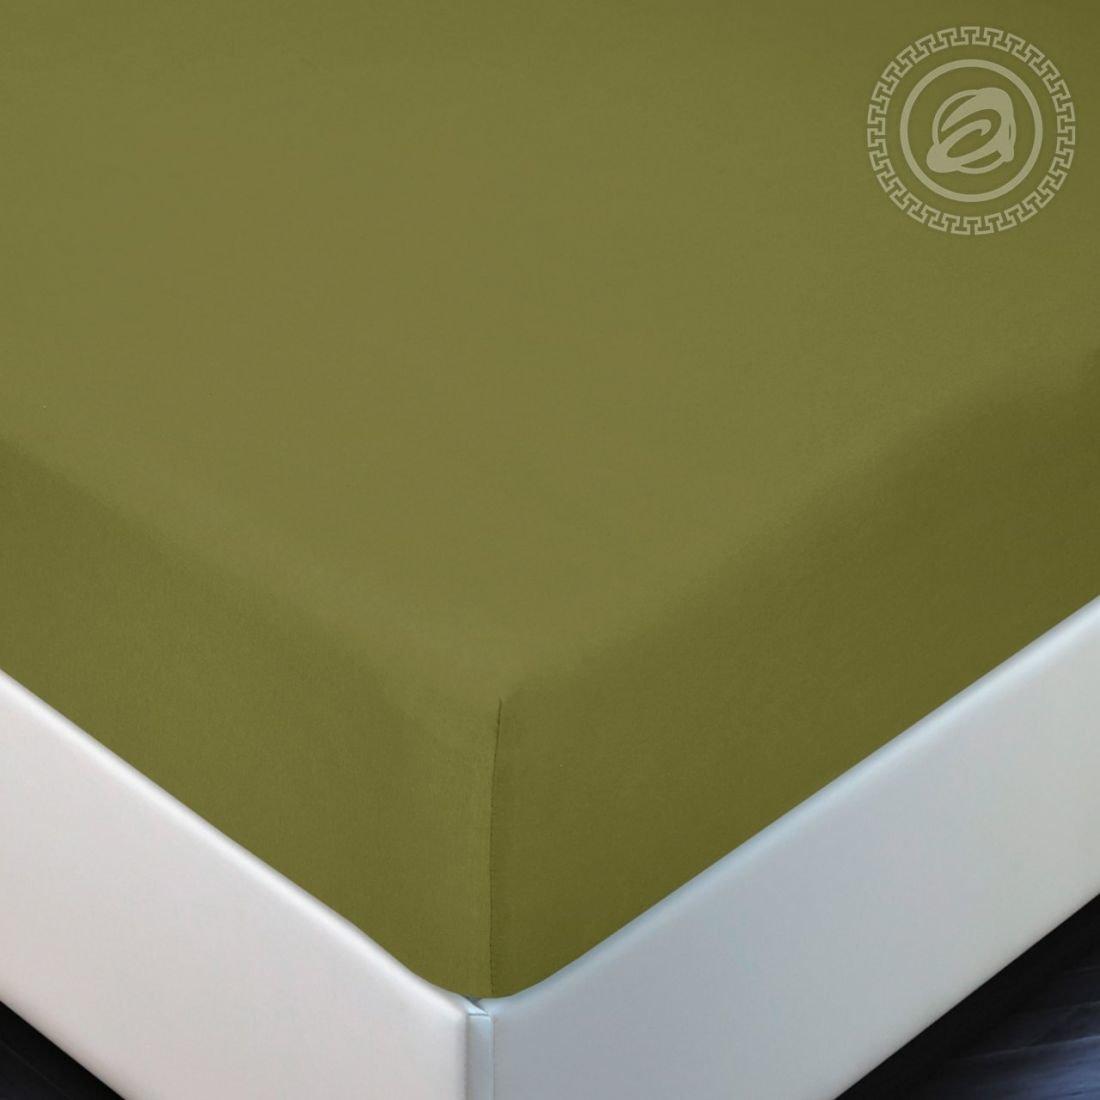 Олива - простынь на резинке, размер 160х200, ткань трикотаж, Артпостель